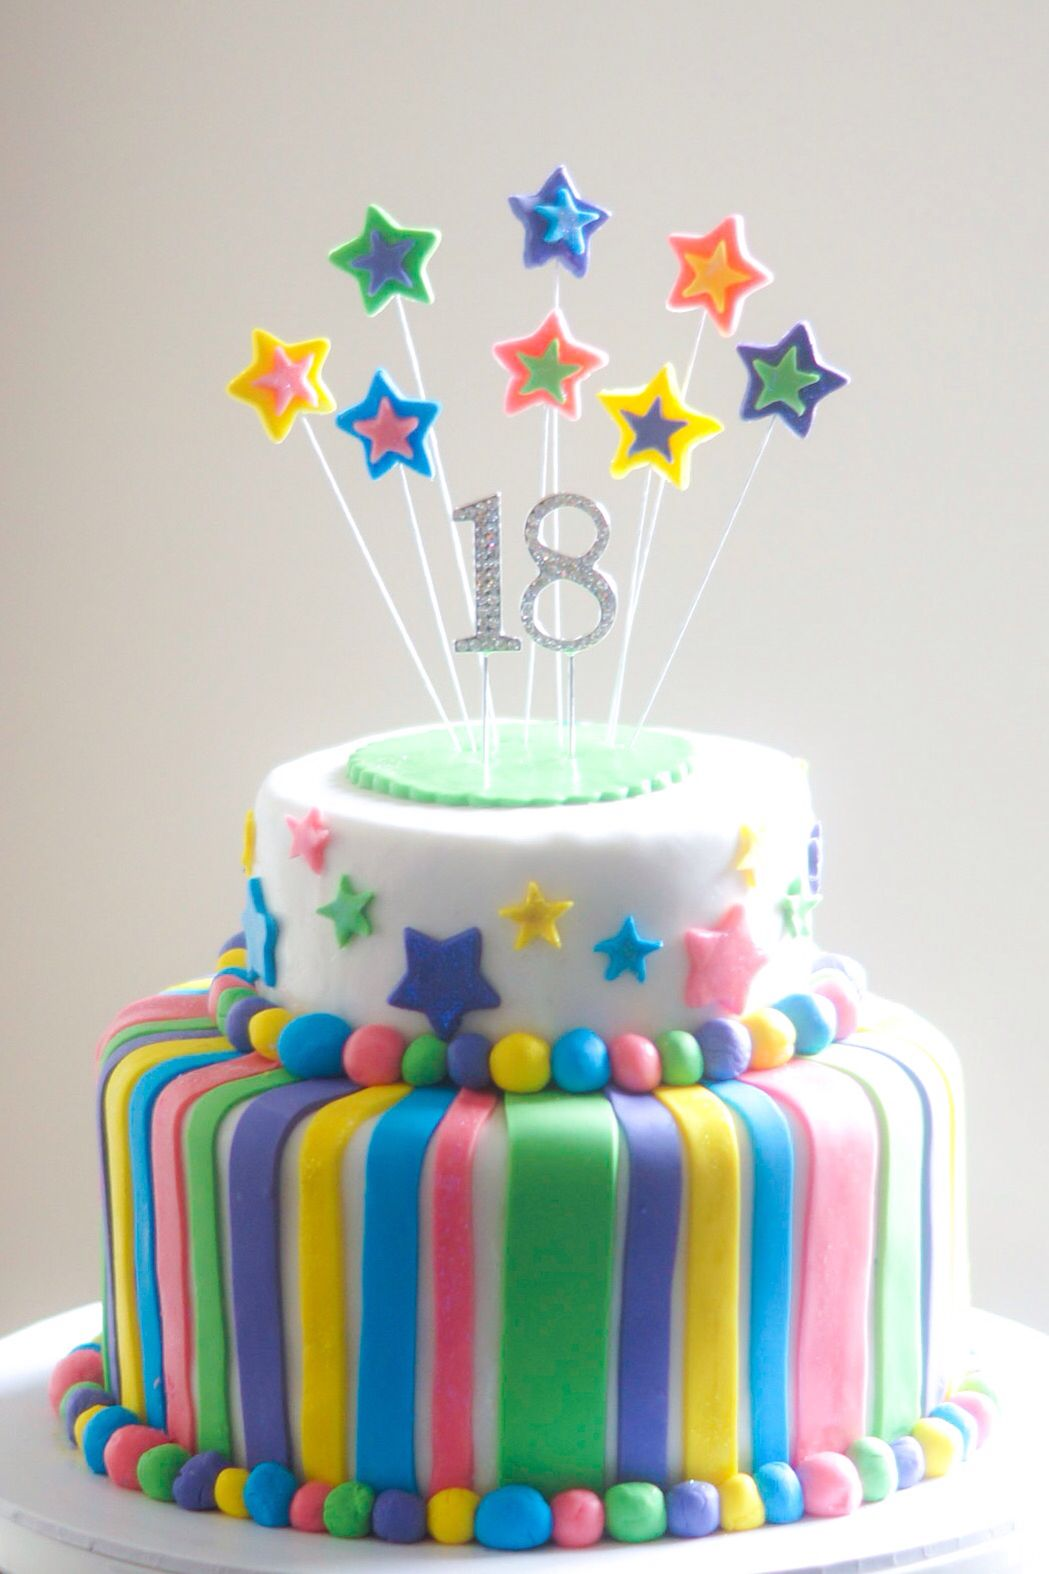 Stripes and stars 18th birthday cake⭐️